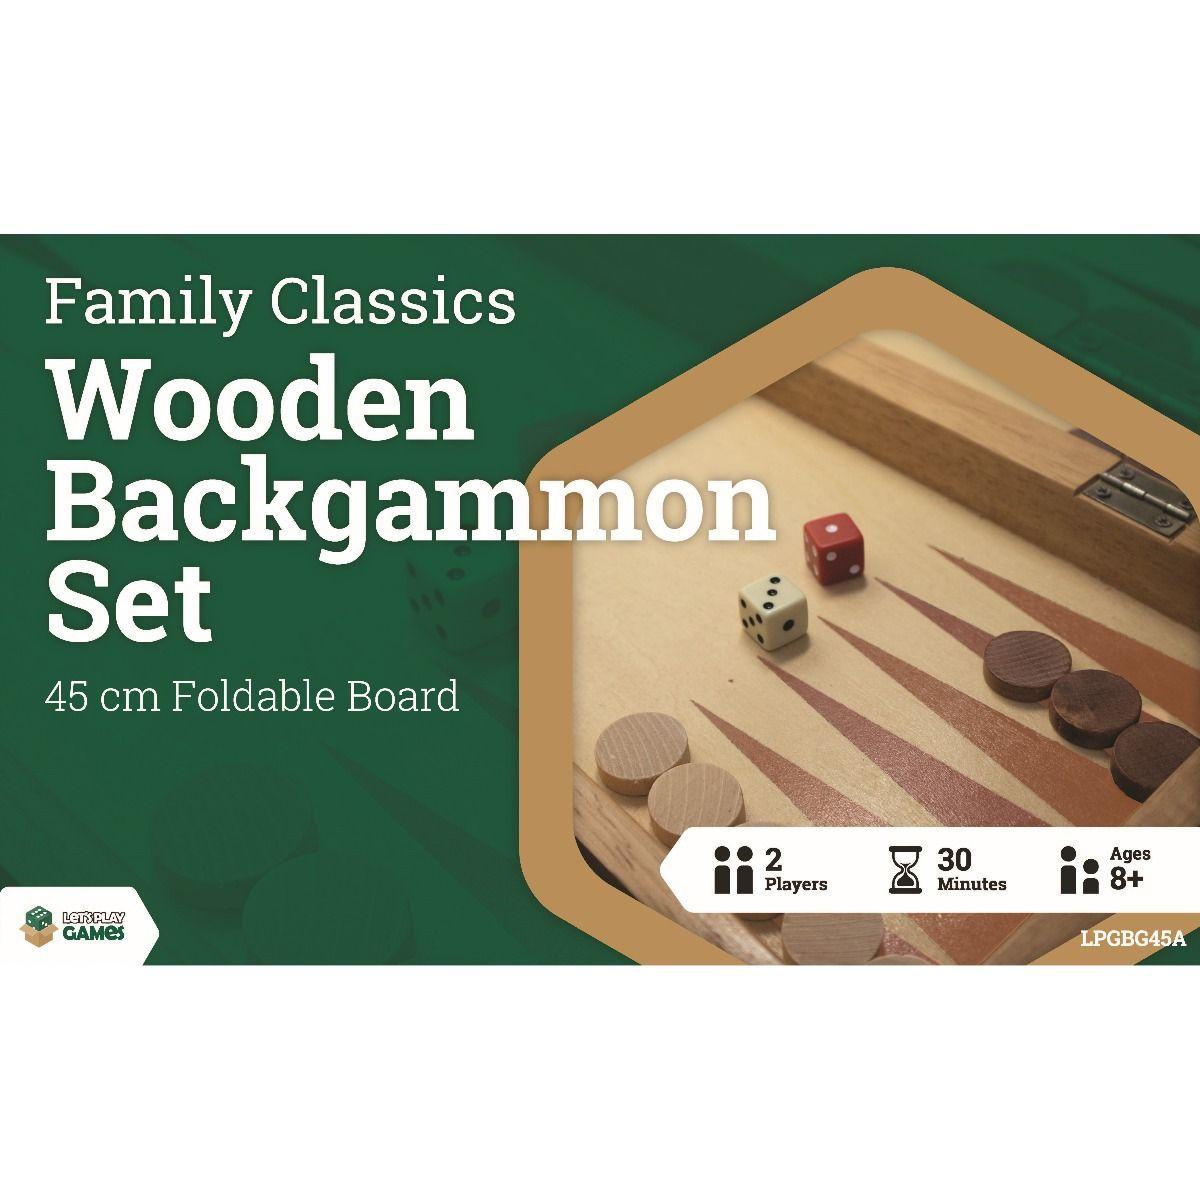 LPG Wooden Folding Backgammon Case 45cm